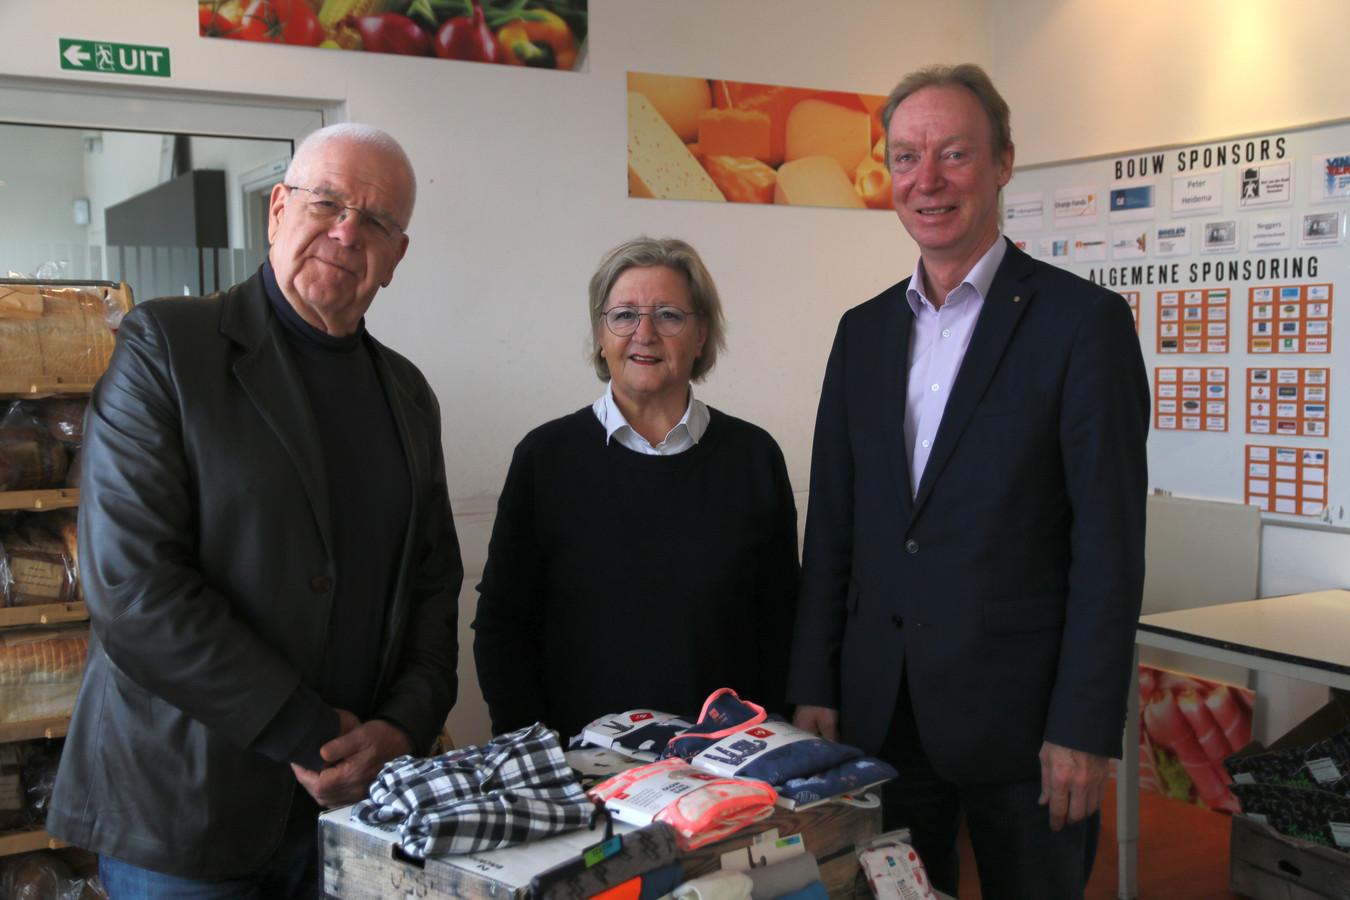 Vlnr. Frans Koeman (Voedselbank),  Barry Haen (Rotary) en Jan de Rond (Mooi Zo Goed Zo).